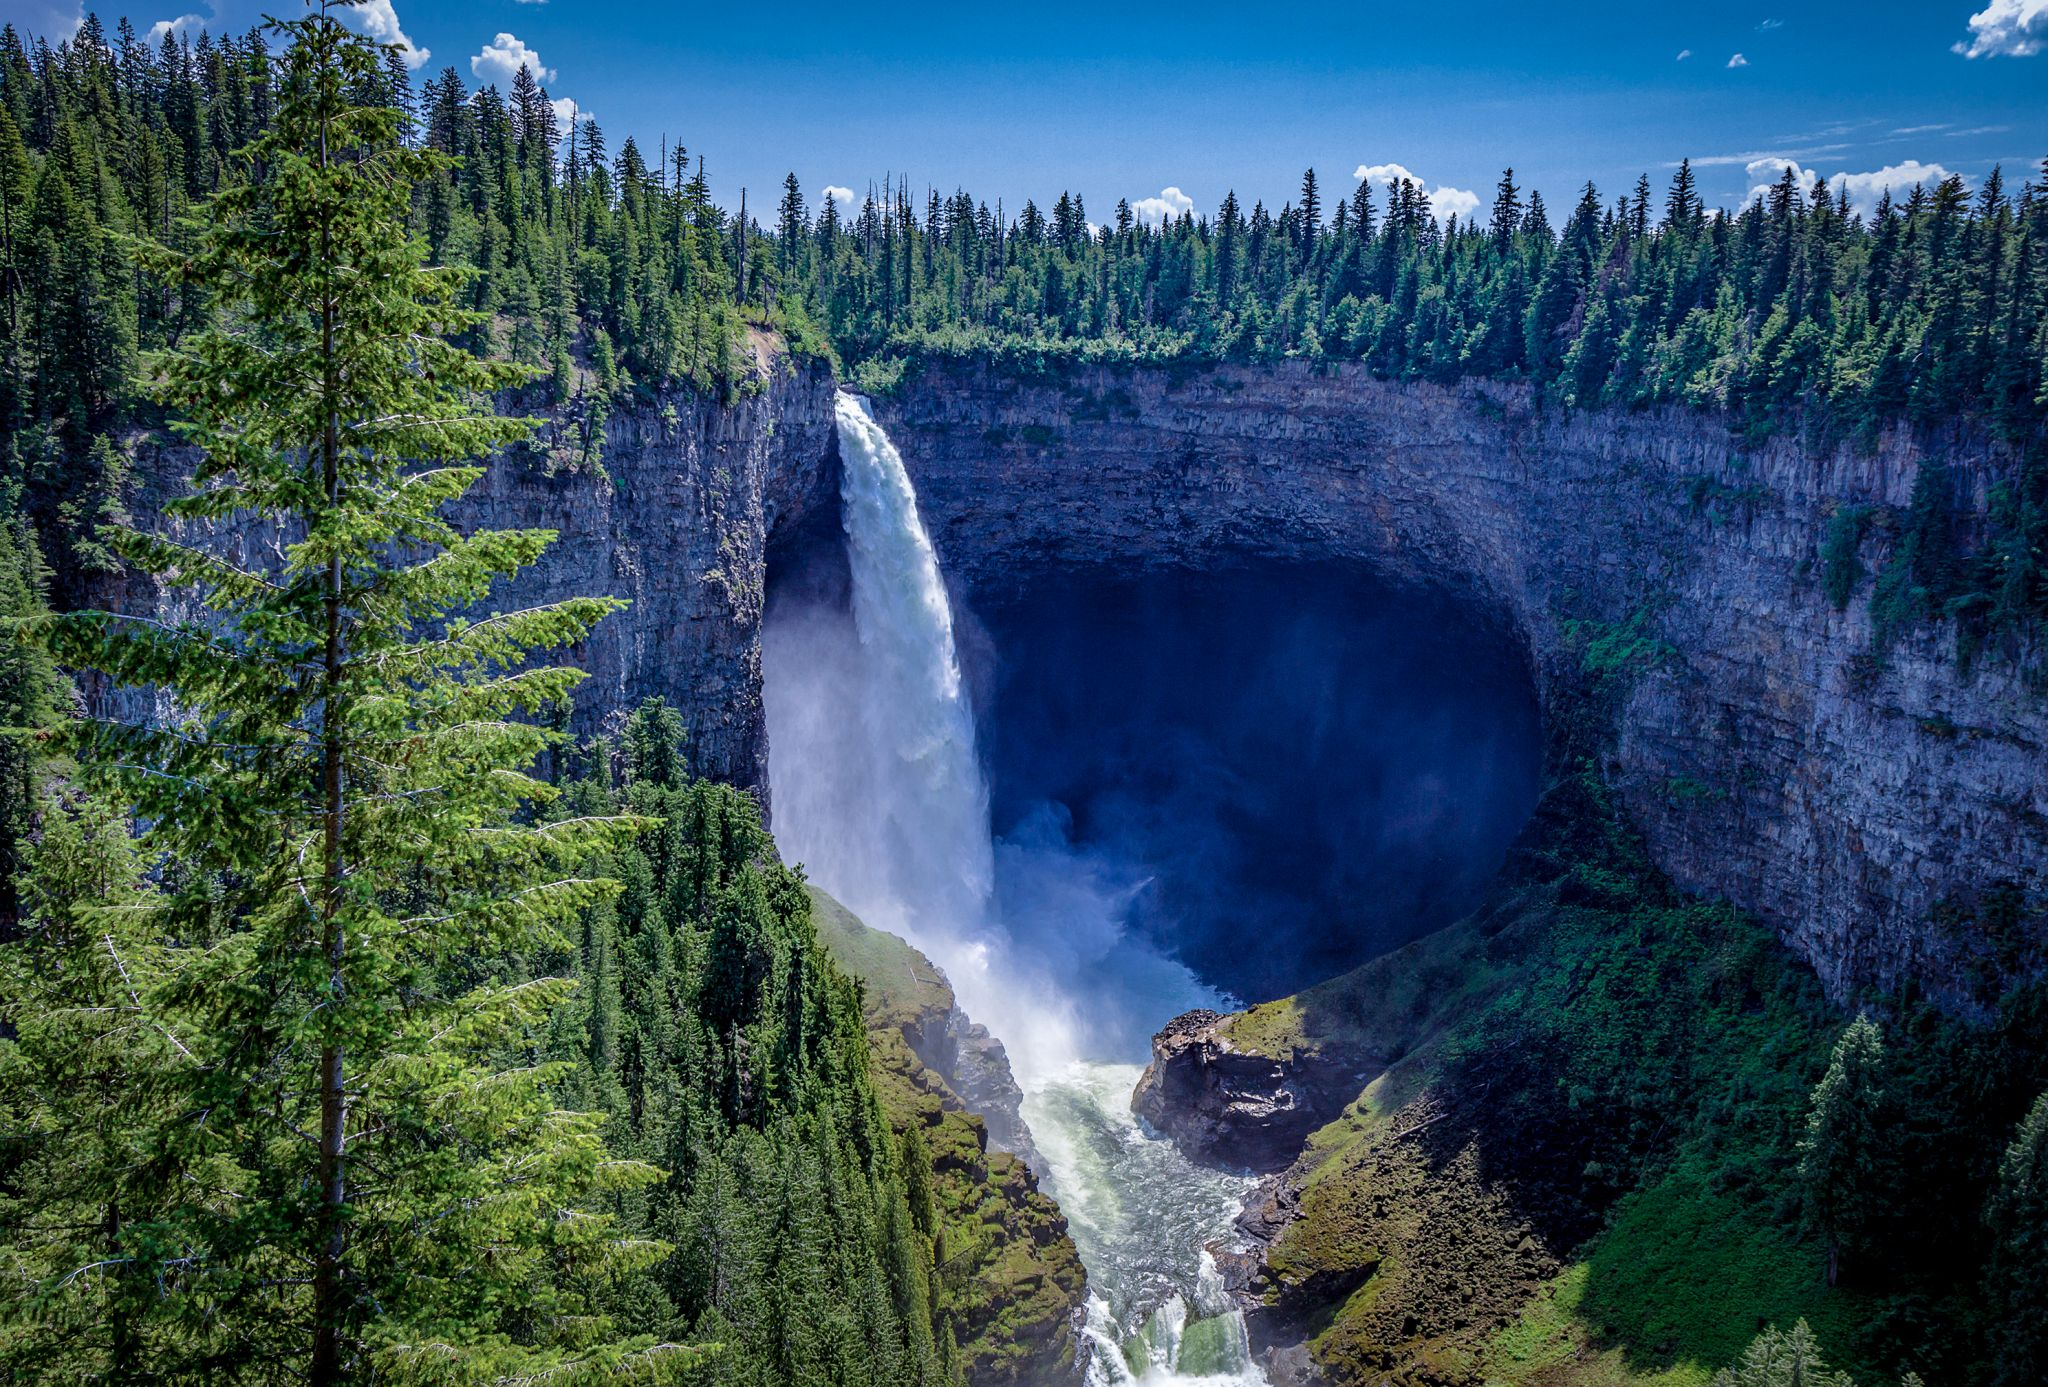 Helmcken falls, Canada